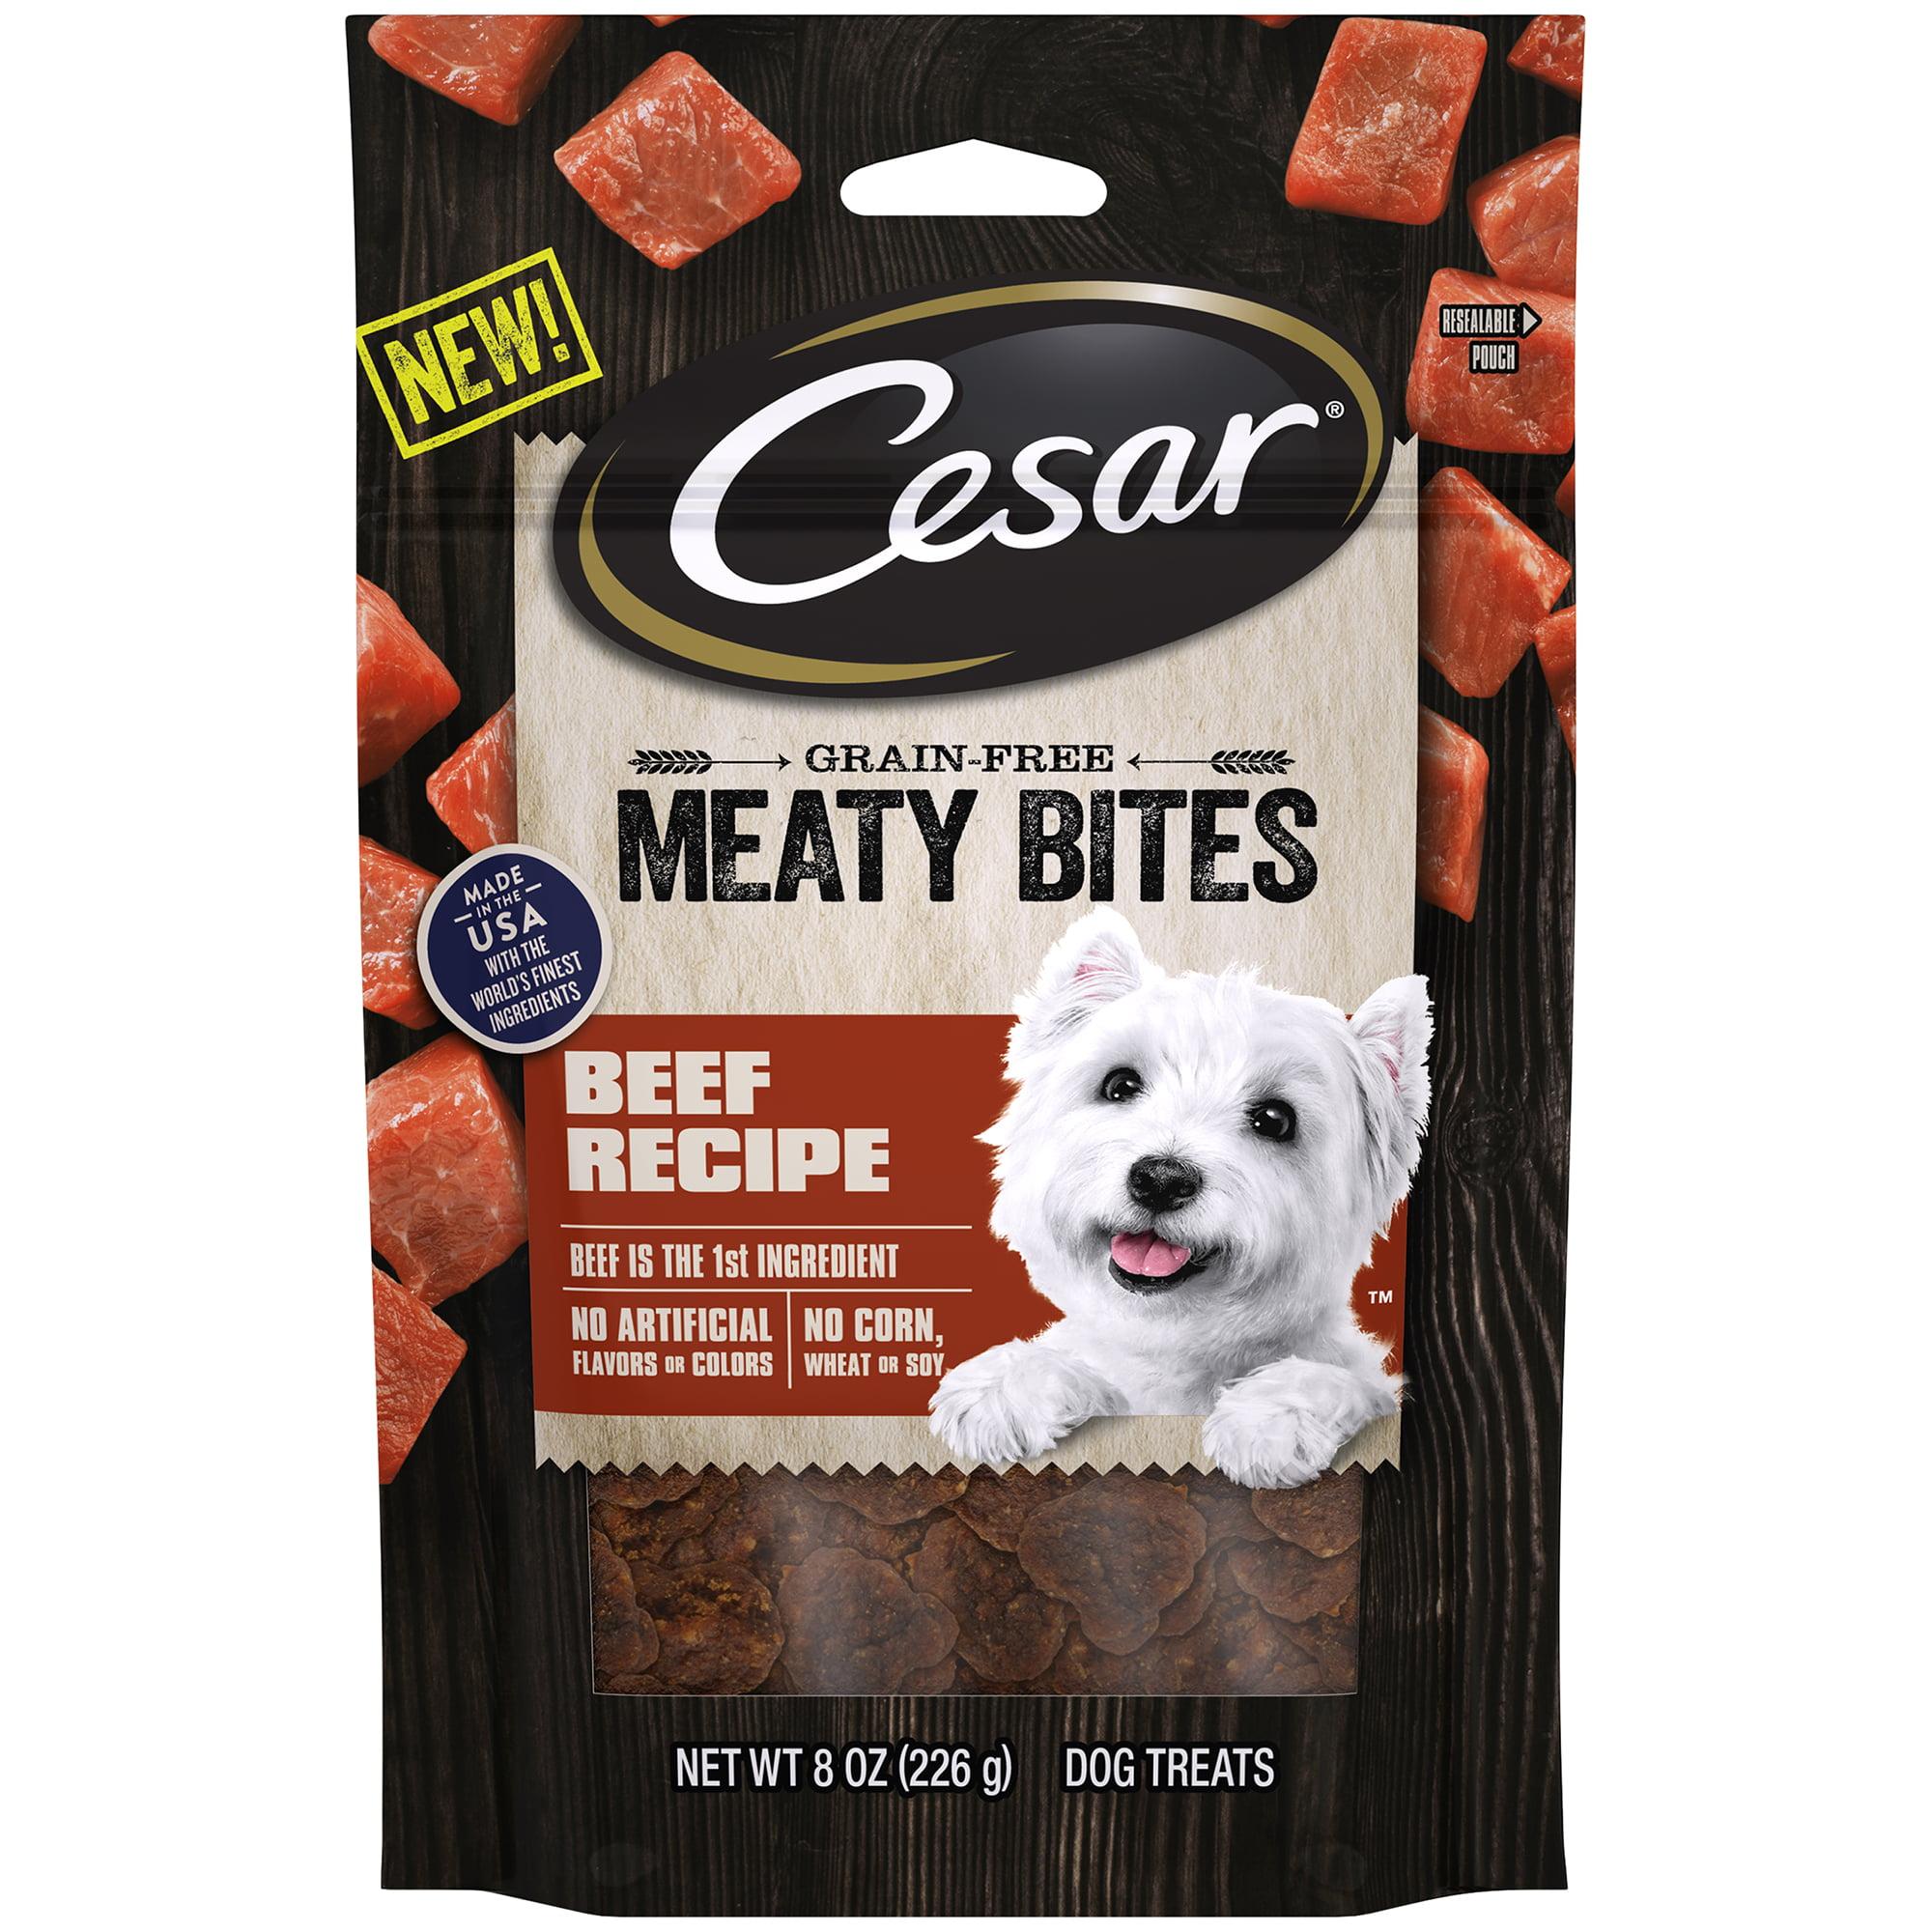 Cesar Meaty Bites Grain Free Dog Treats Beef Recipe, 8 oz. Pouch